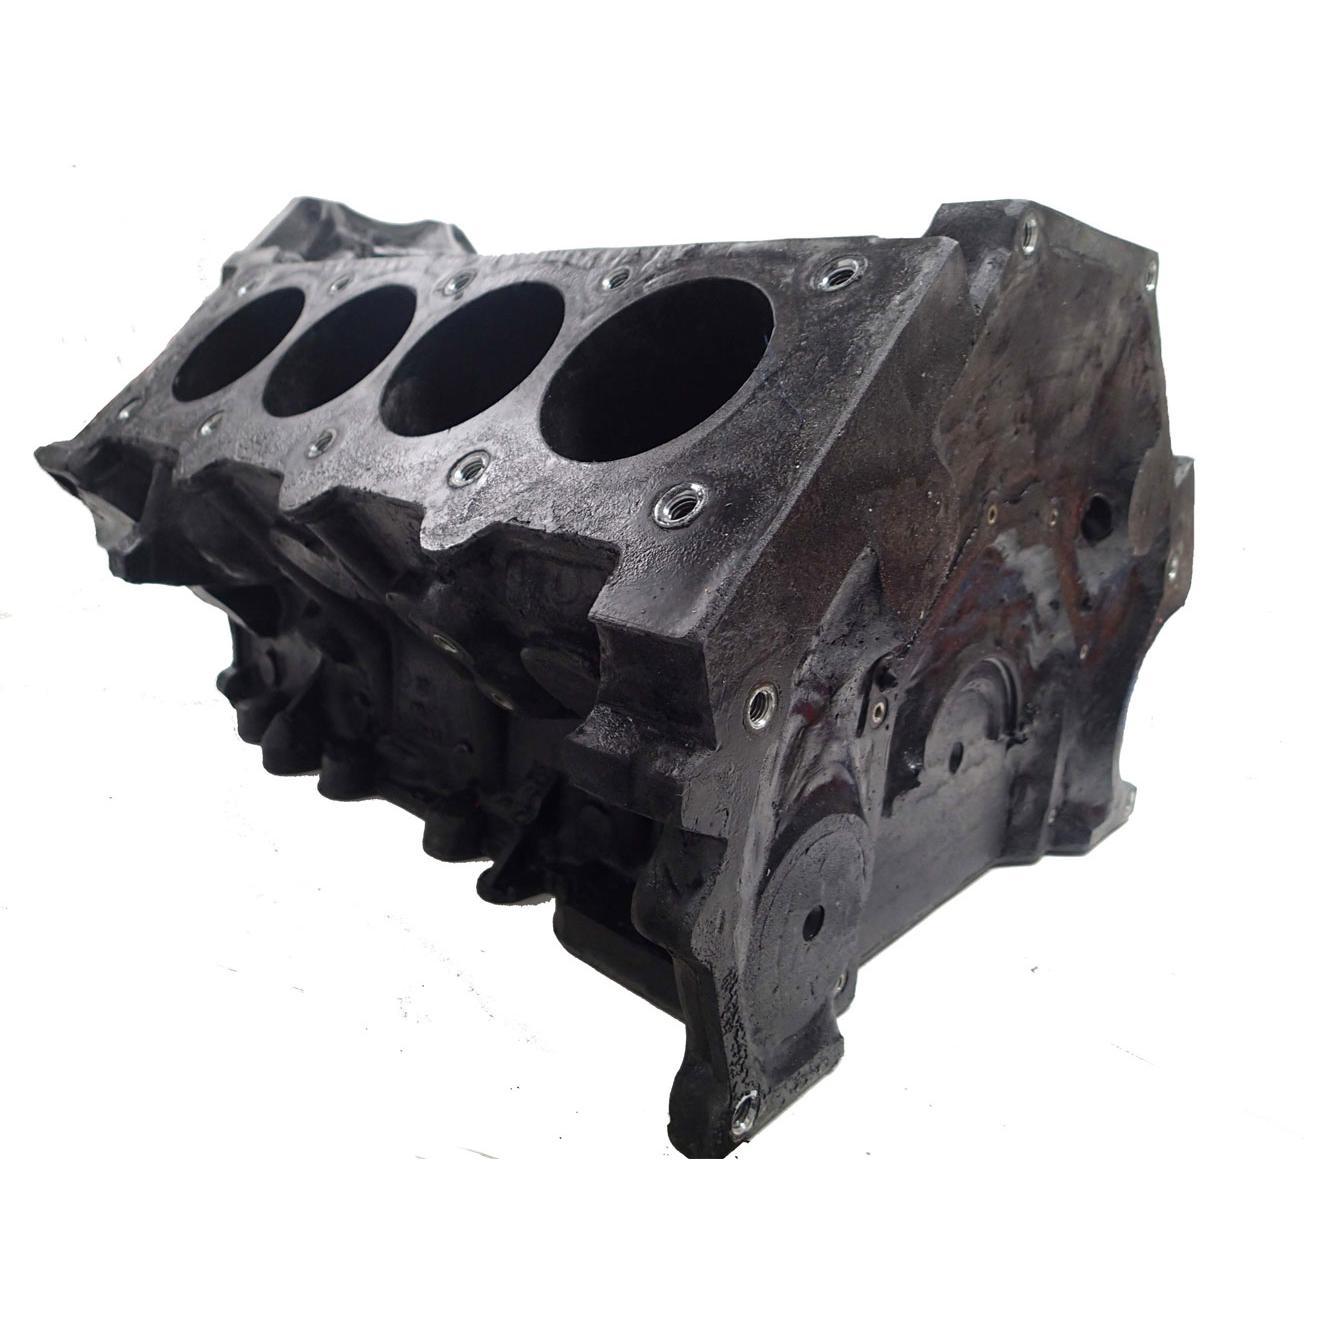 Fake P Ayr Chevrolet Lt1: FAKE P-Ayr Ford 4.6 OHV Short Block Mock Up Engine